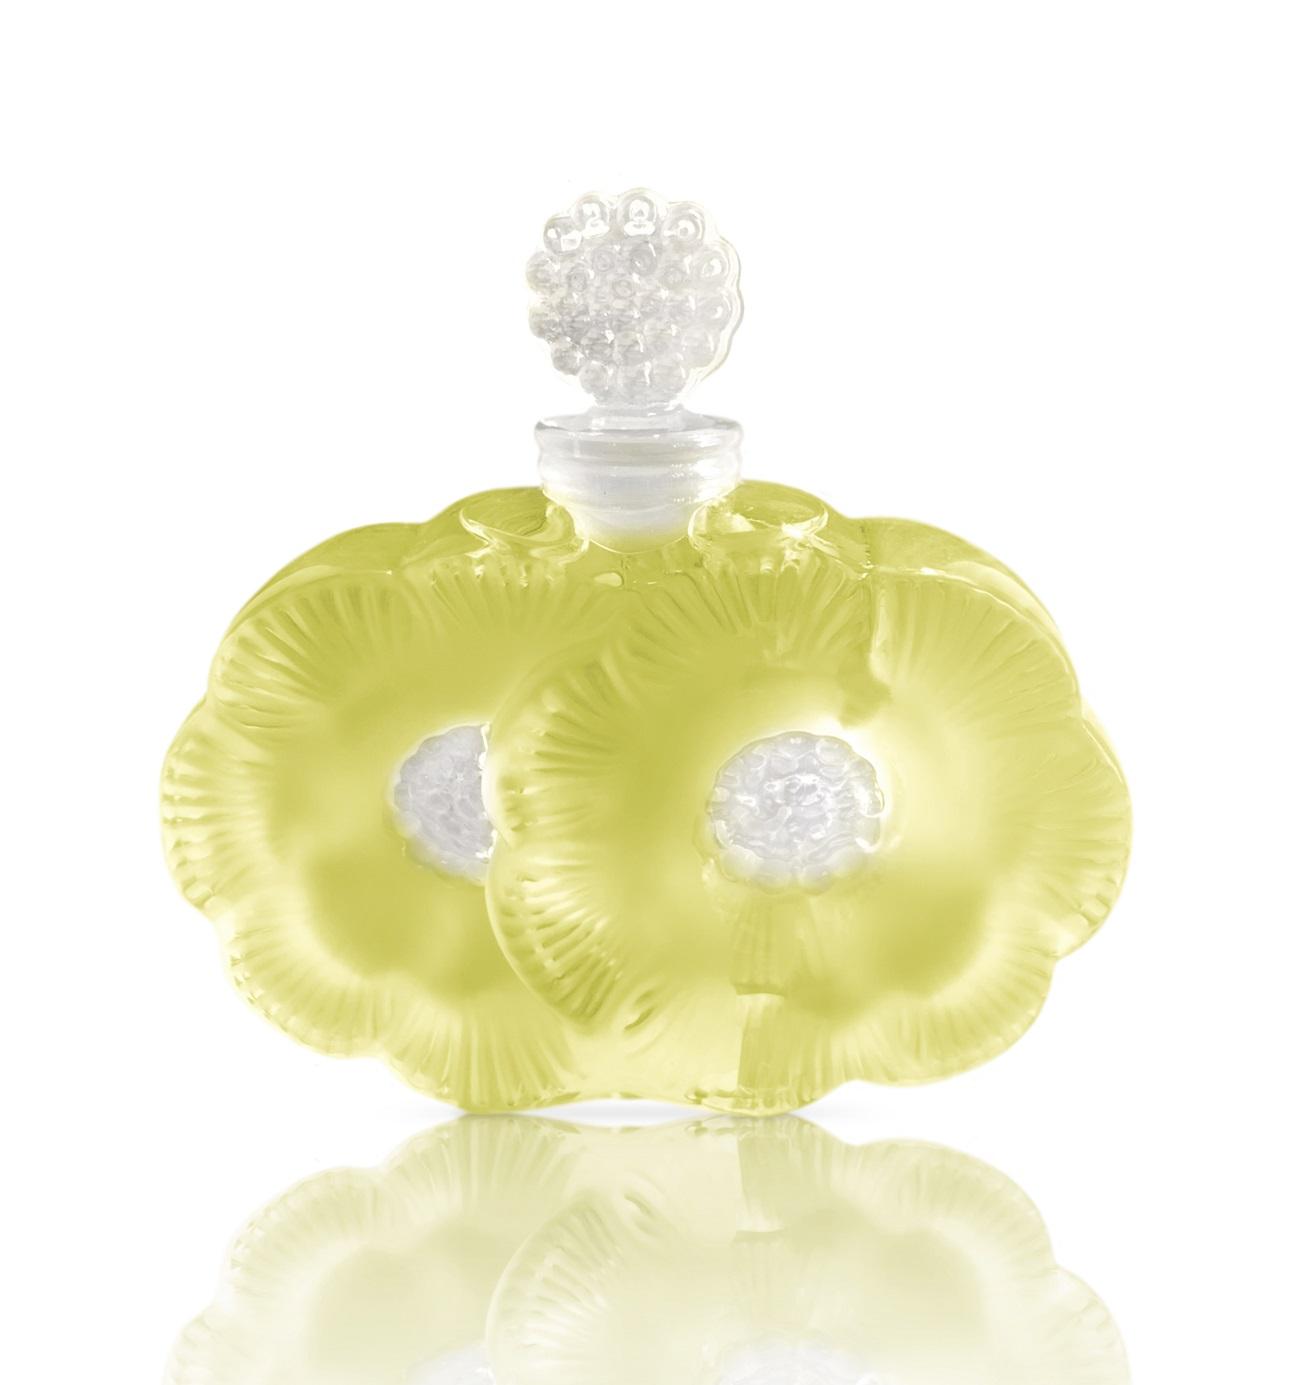 Shalini-Paradis-Provenceo-Lalique-Crystal-Flacon.jpg